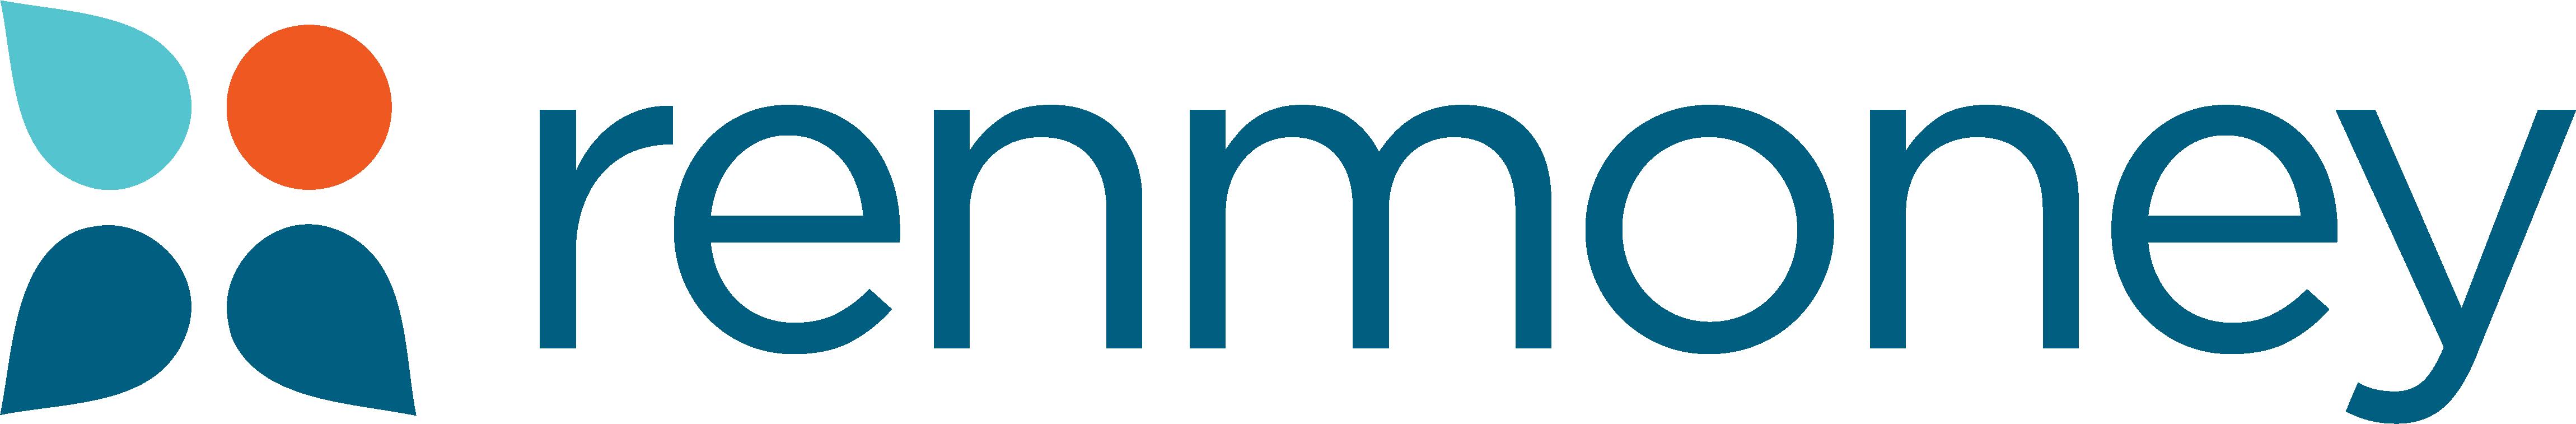 Renmoney Wins Fintech Award for Innovation in Lending